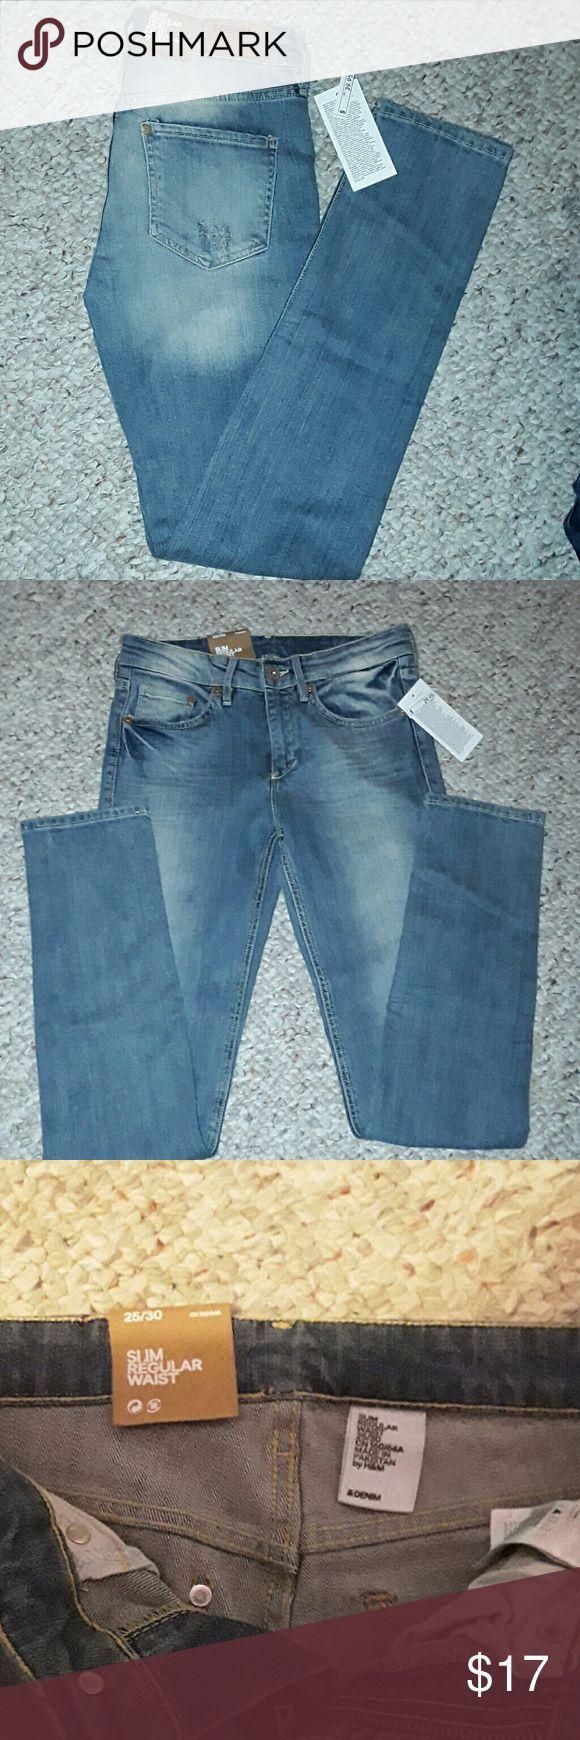 NWT HM Light Wash Skinny Jeans Size 25/30 HM light wash skinny jeans size 25/30 hm Jeans Skinny